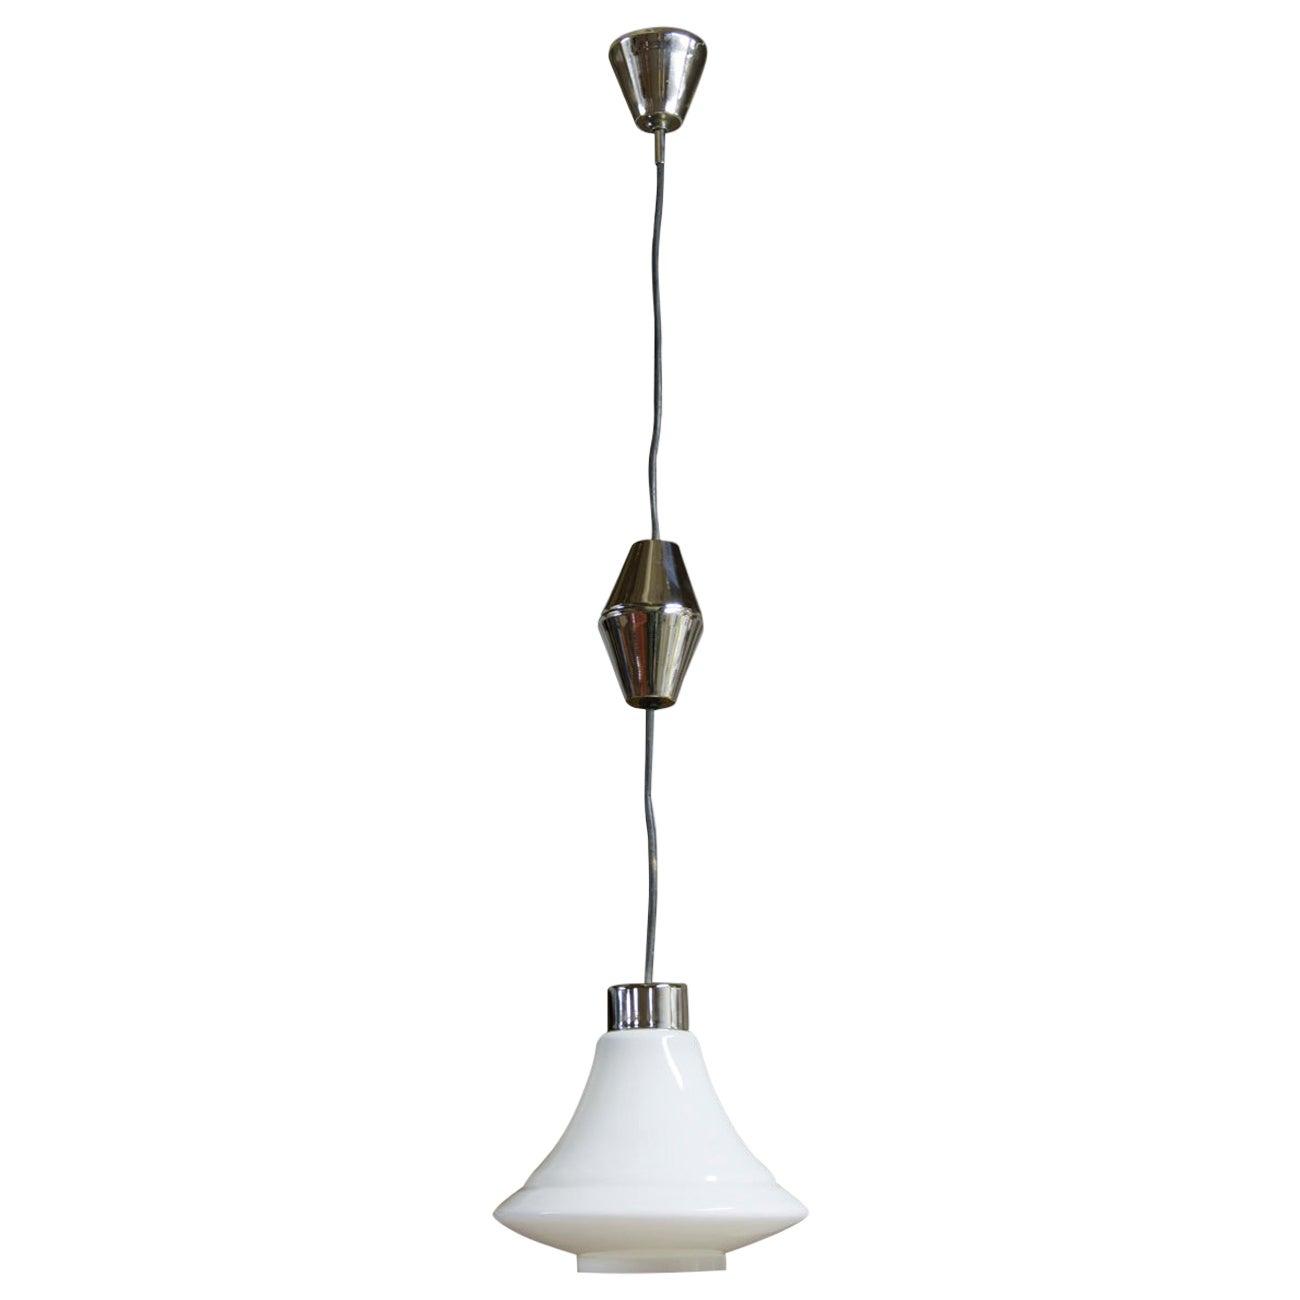 Czechoslovak Single Pendant Lamp, 1970s